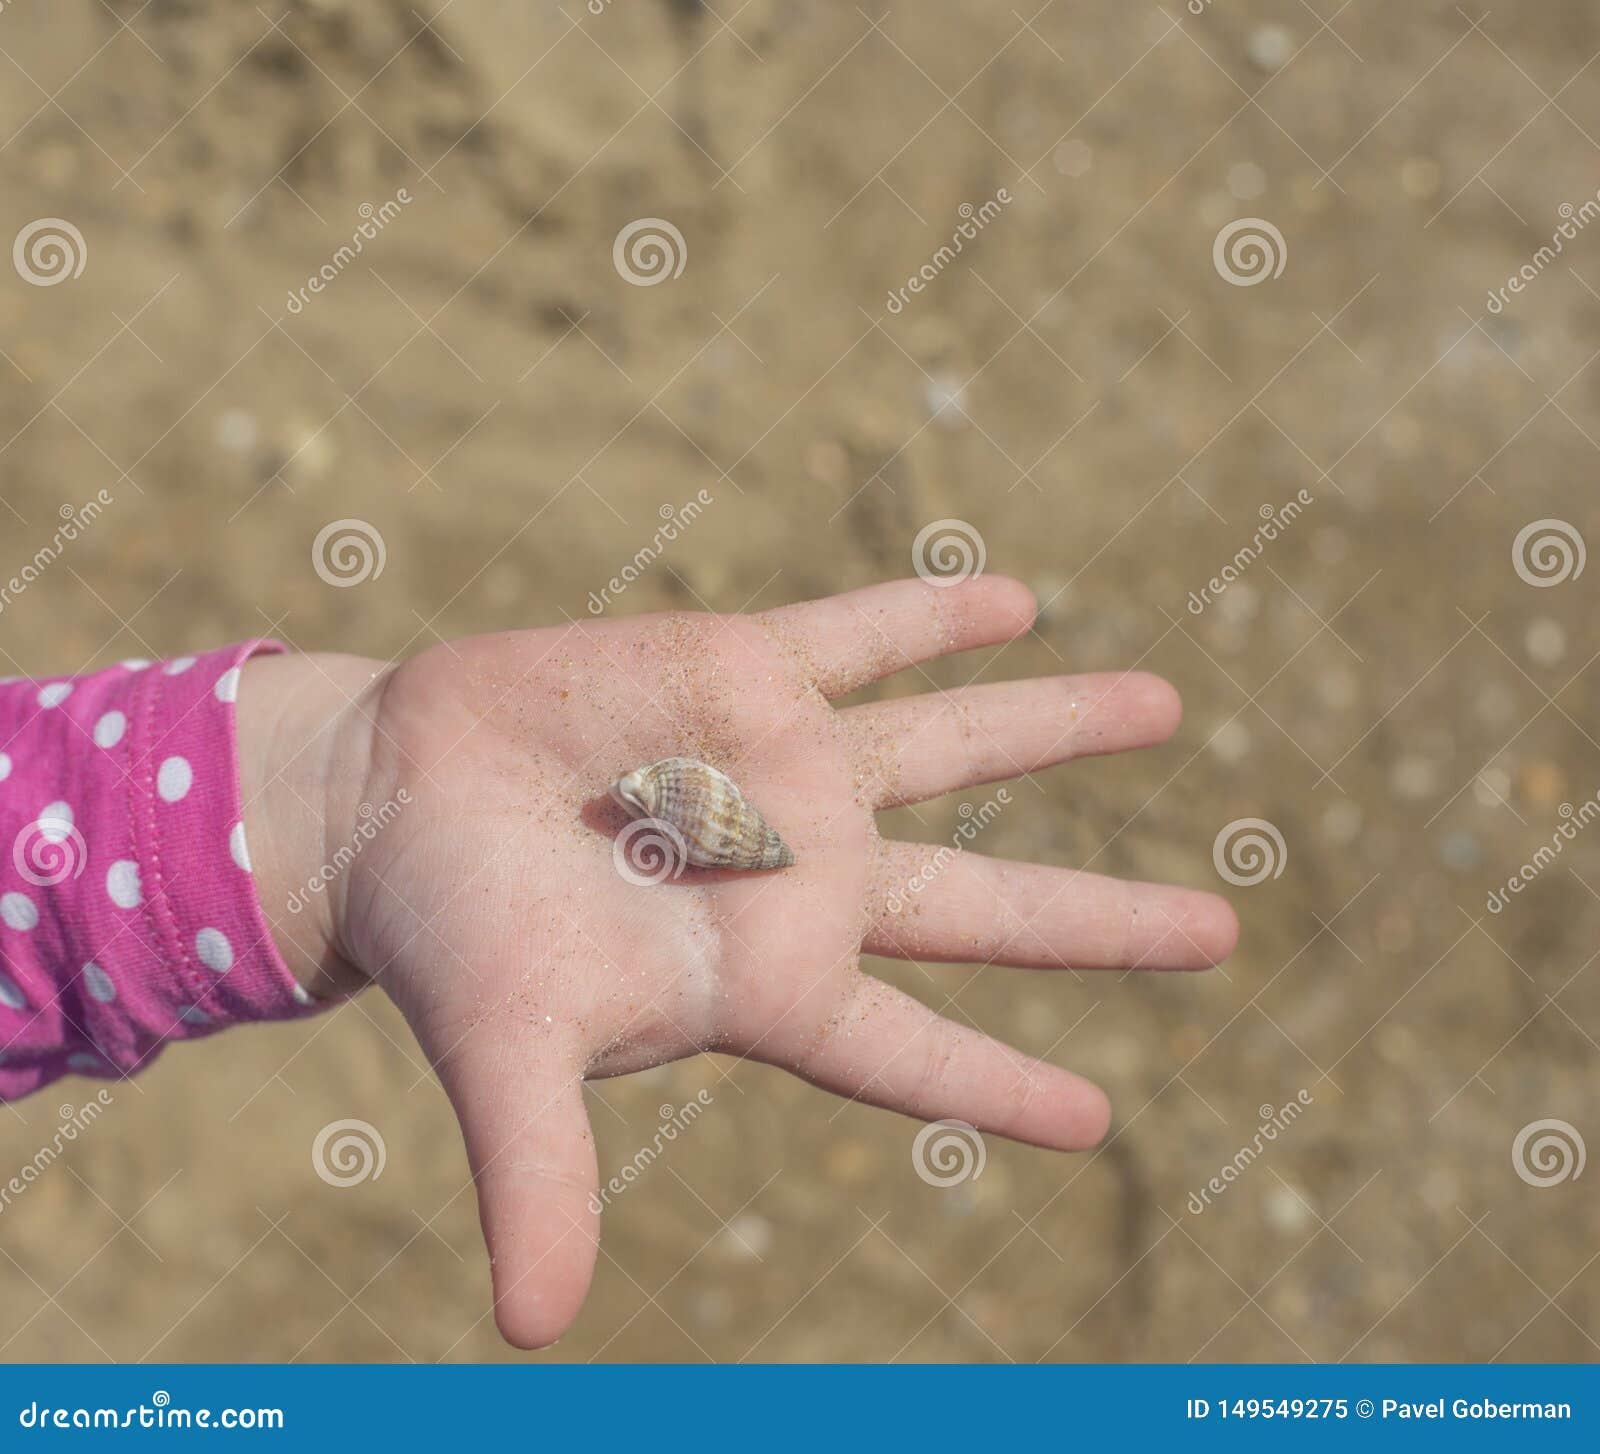 Handen med skalet p? sandbakgrund barns hand som rymmer ett skal p?, g?mma i handflatan